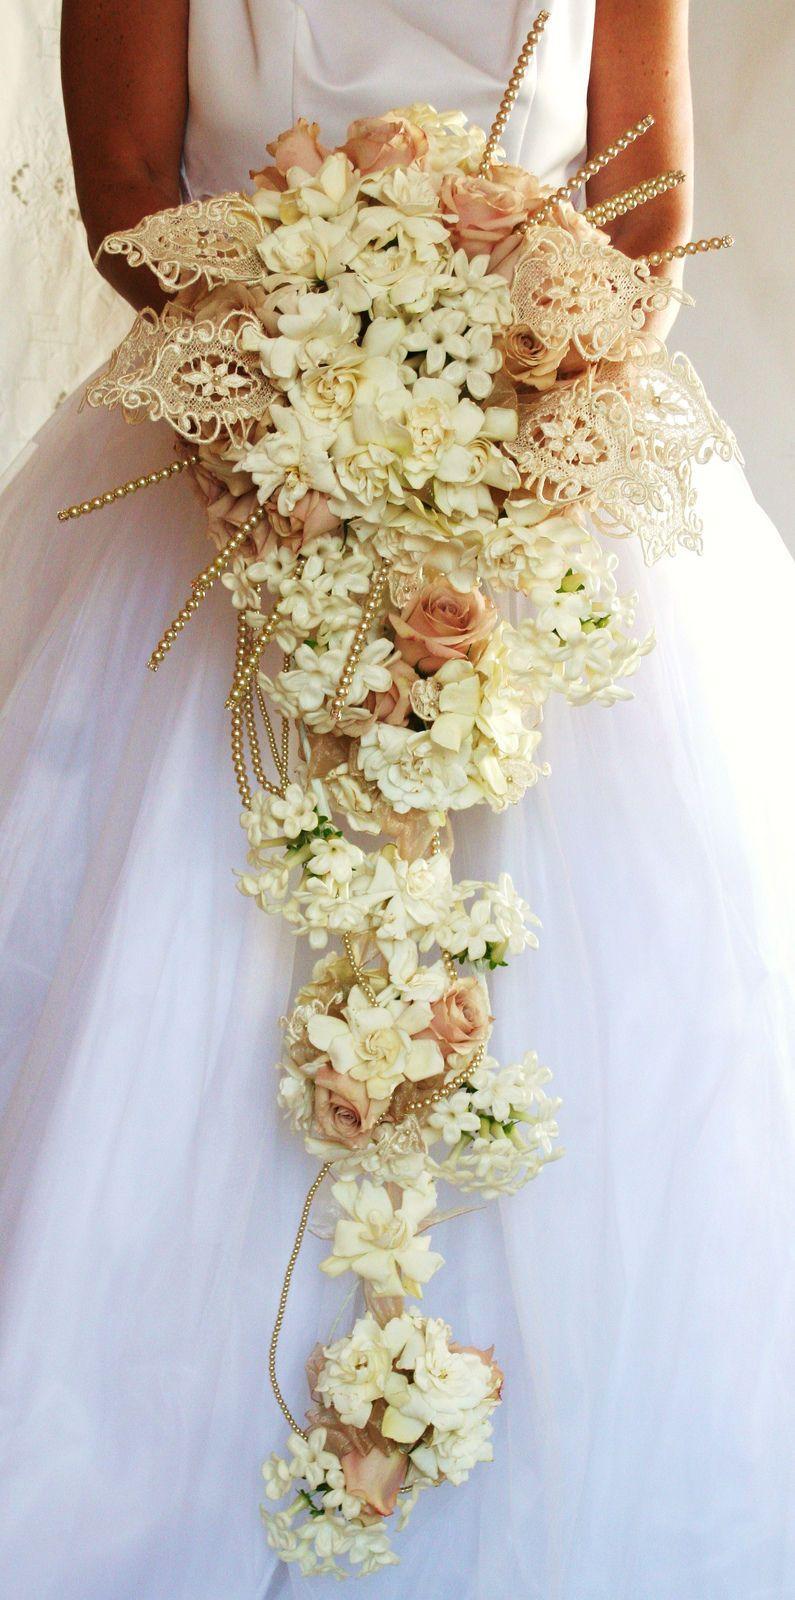 A TRaditional Bridal White Cascade Bouquet   Bridal bouquet